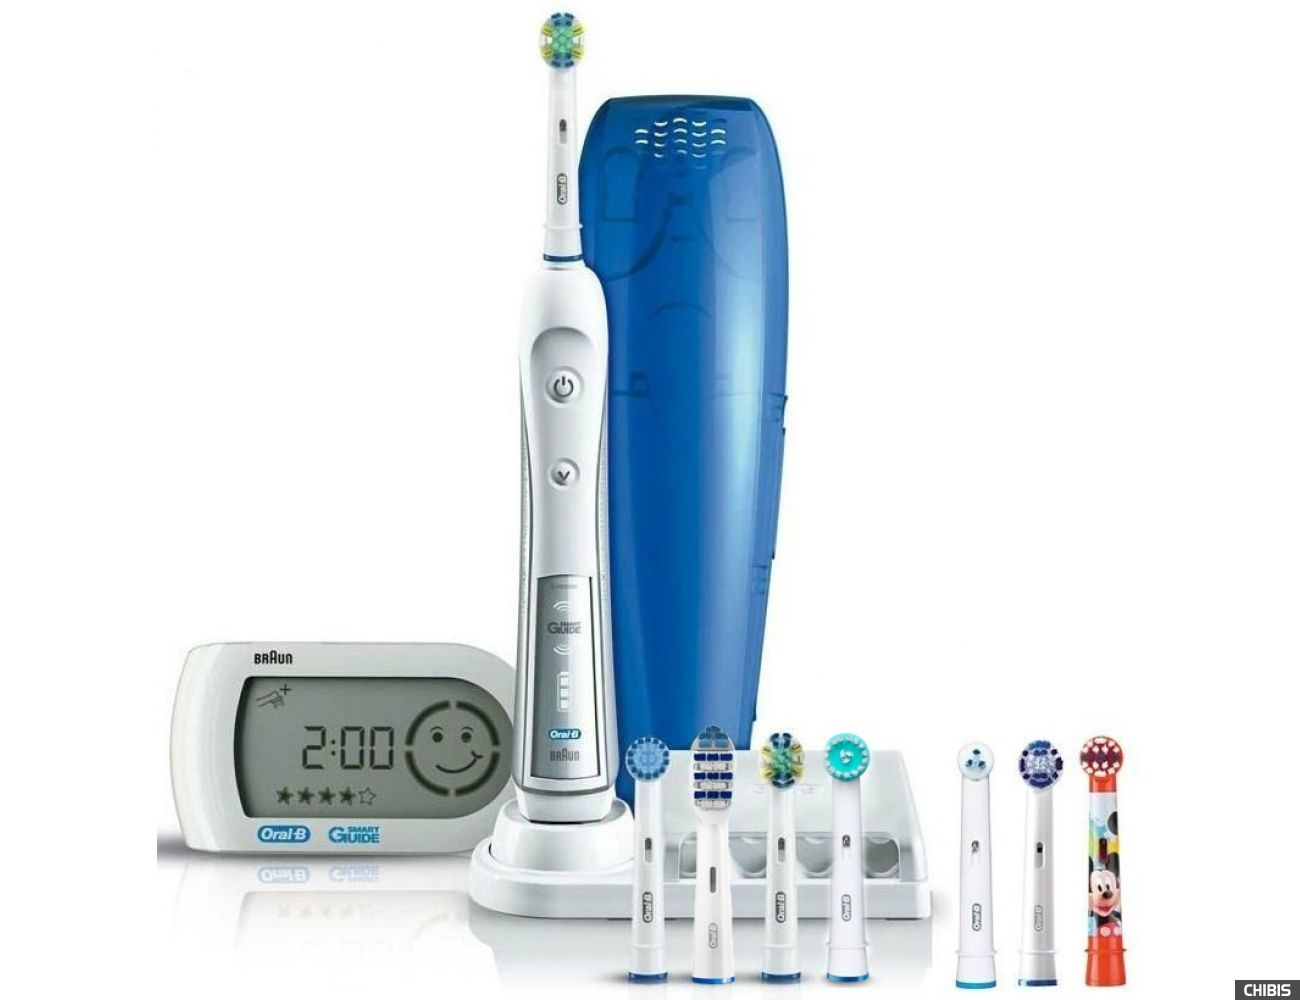 Электрическая зубная щетка Oral B Braun Professional Care 5000 Triumph Trizone D34.575.5x 7 нас